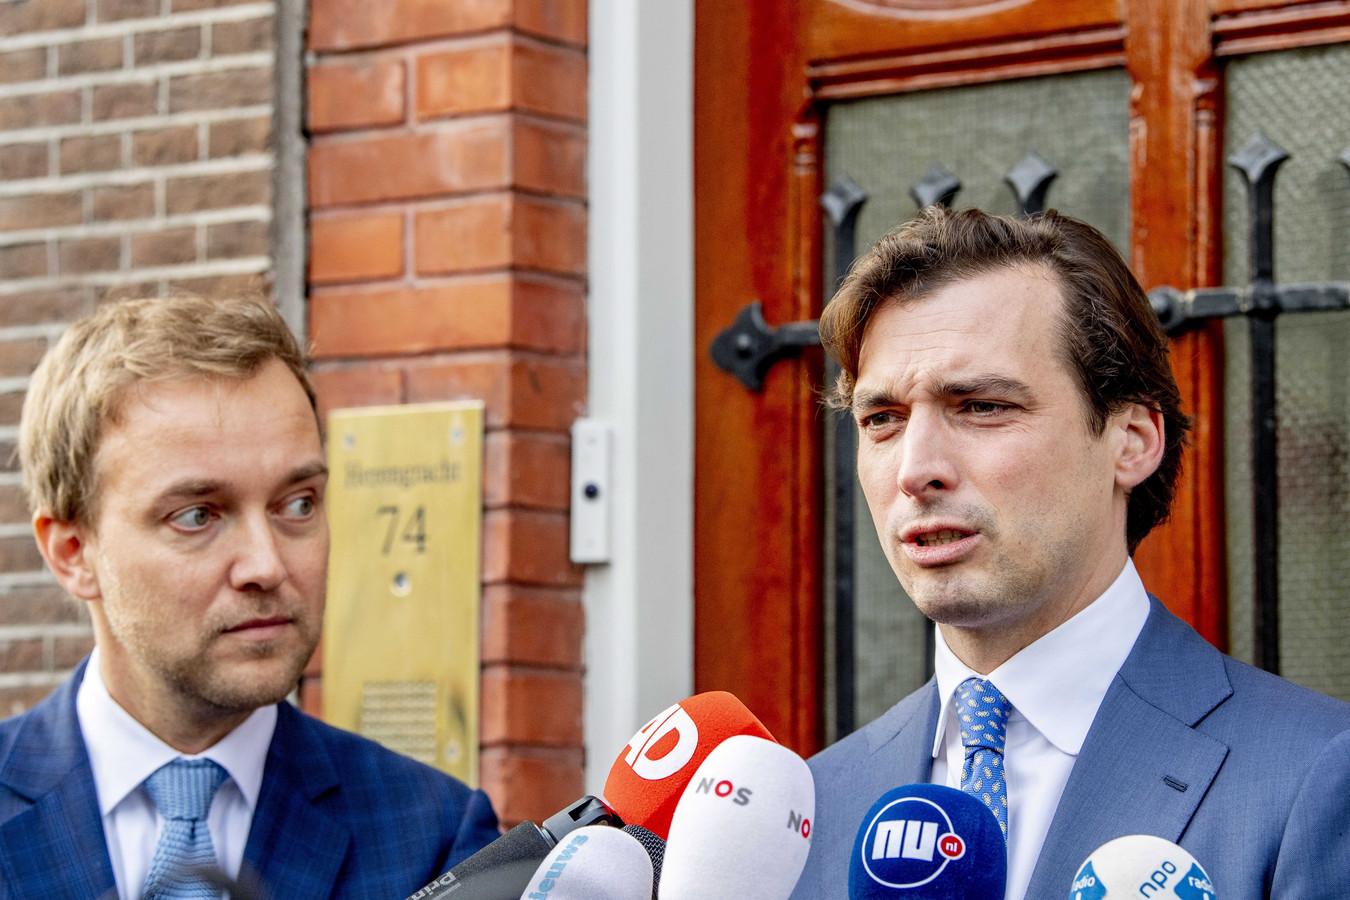 Thierry Baudet  en Lennart van der Linden